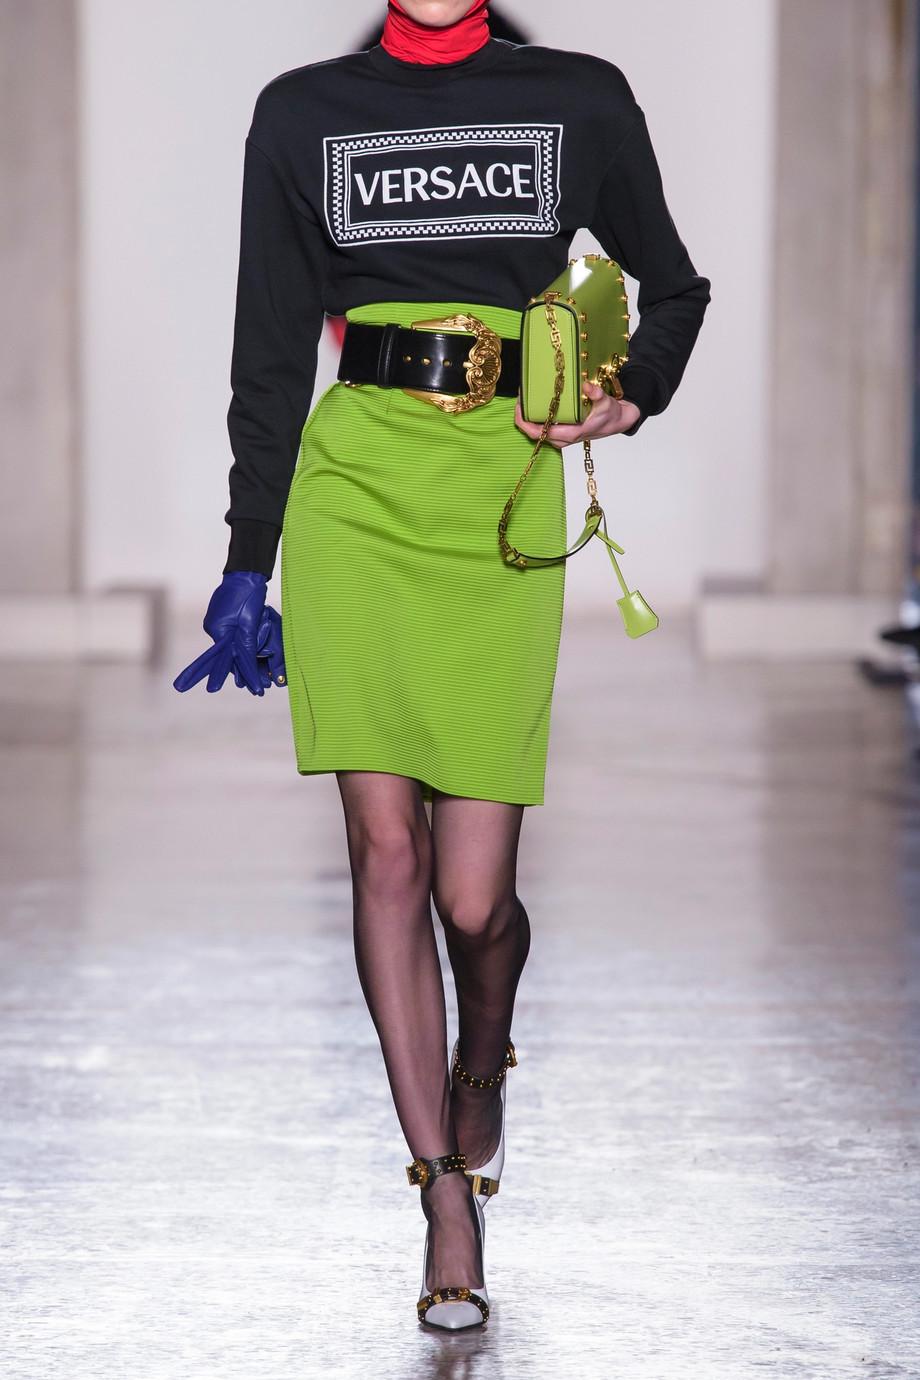 Versace Ribbed-knit skirt $975